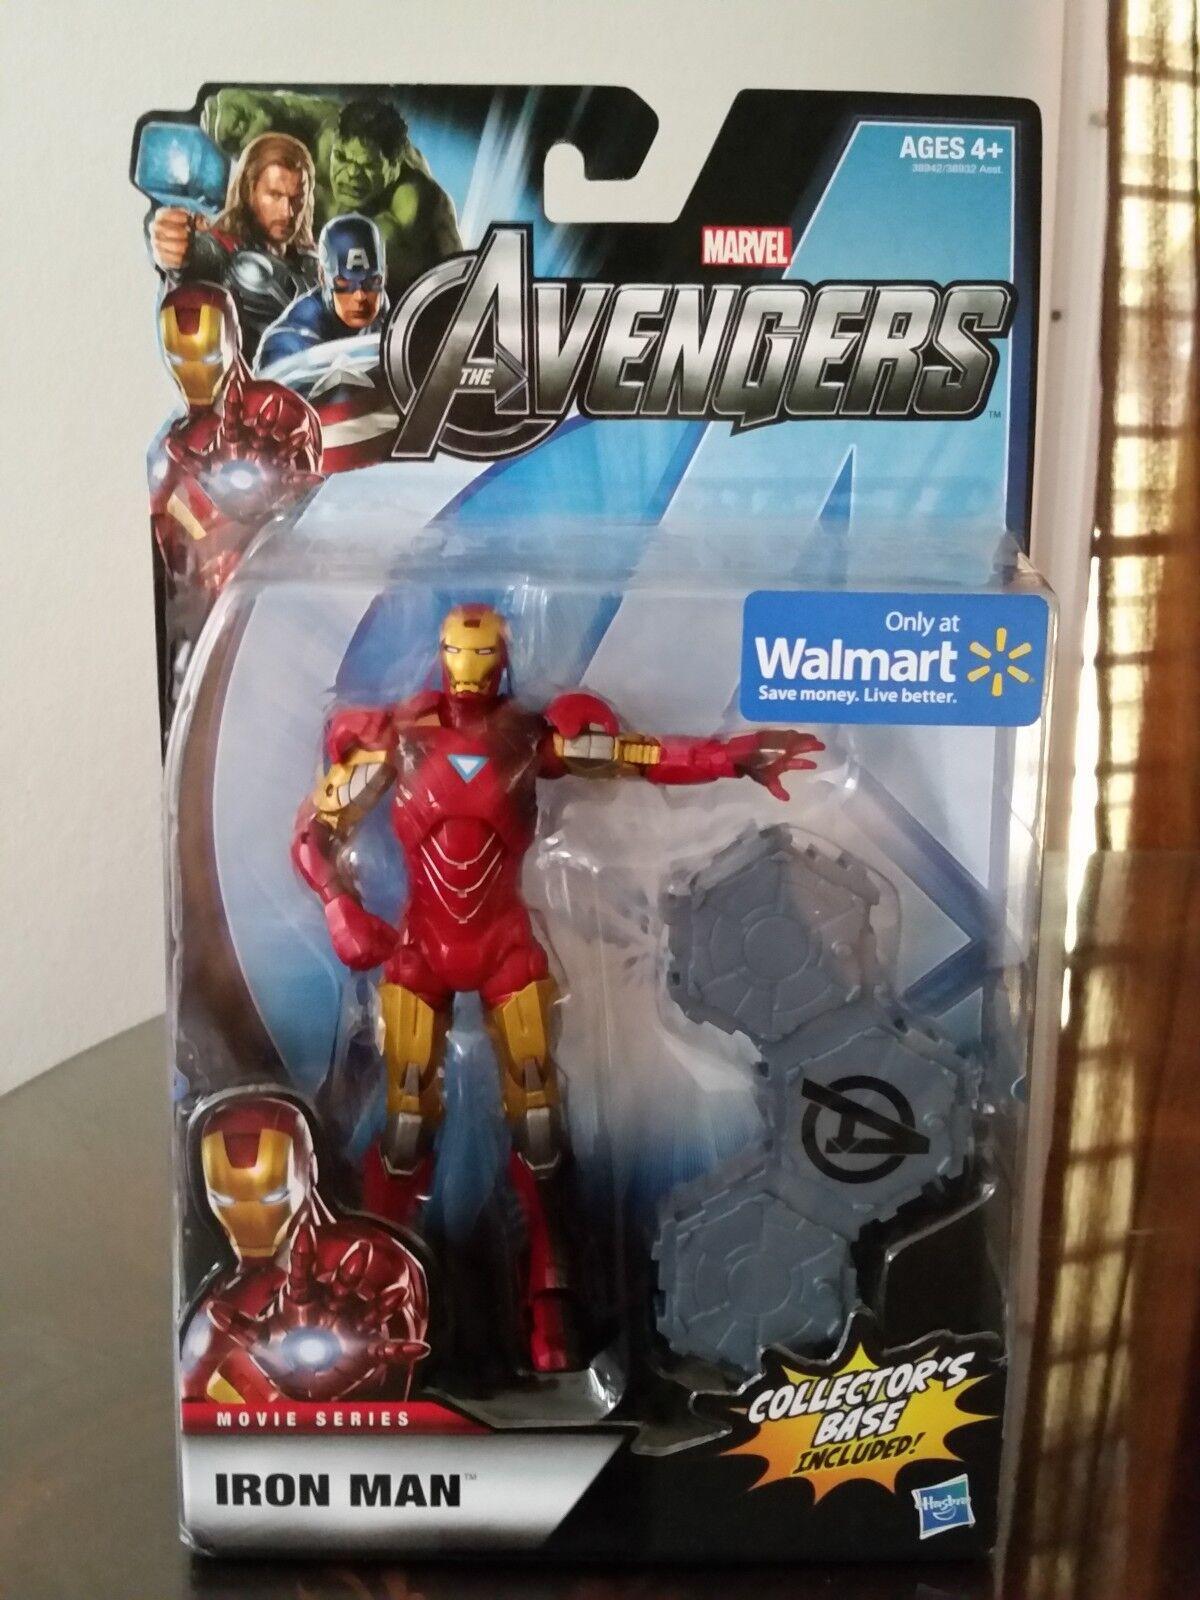 Iron man mark vi marvel die avengers actionfigur hasbro walmart exklusiv